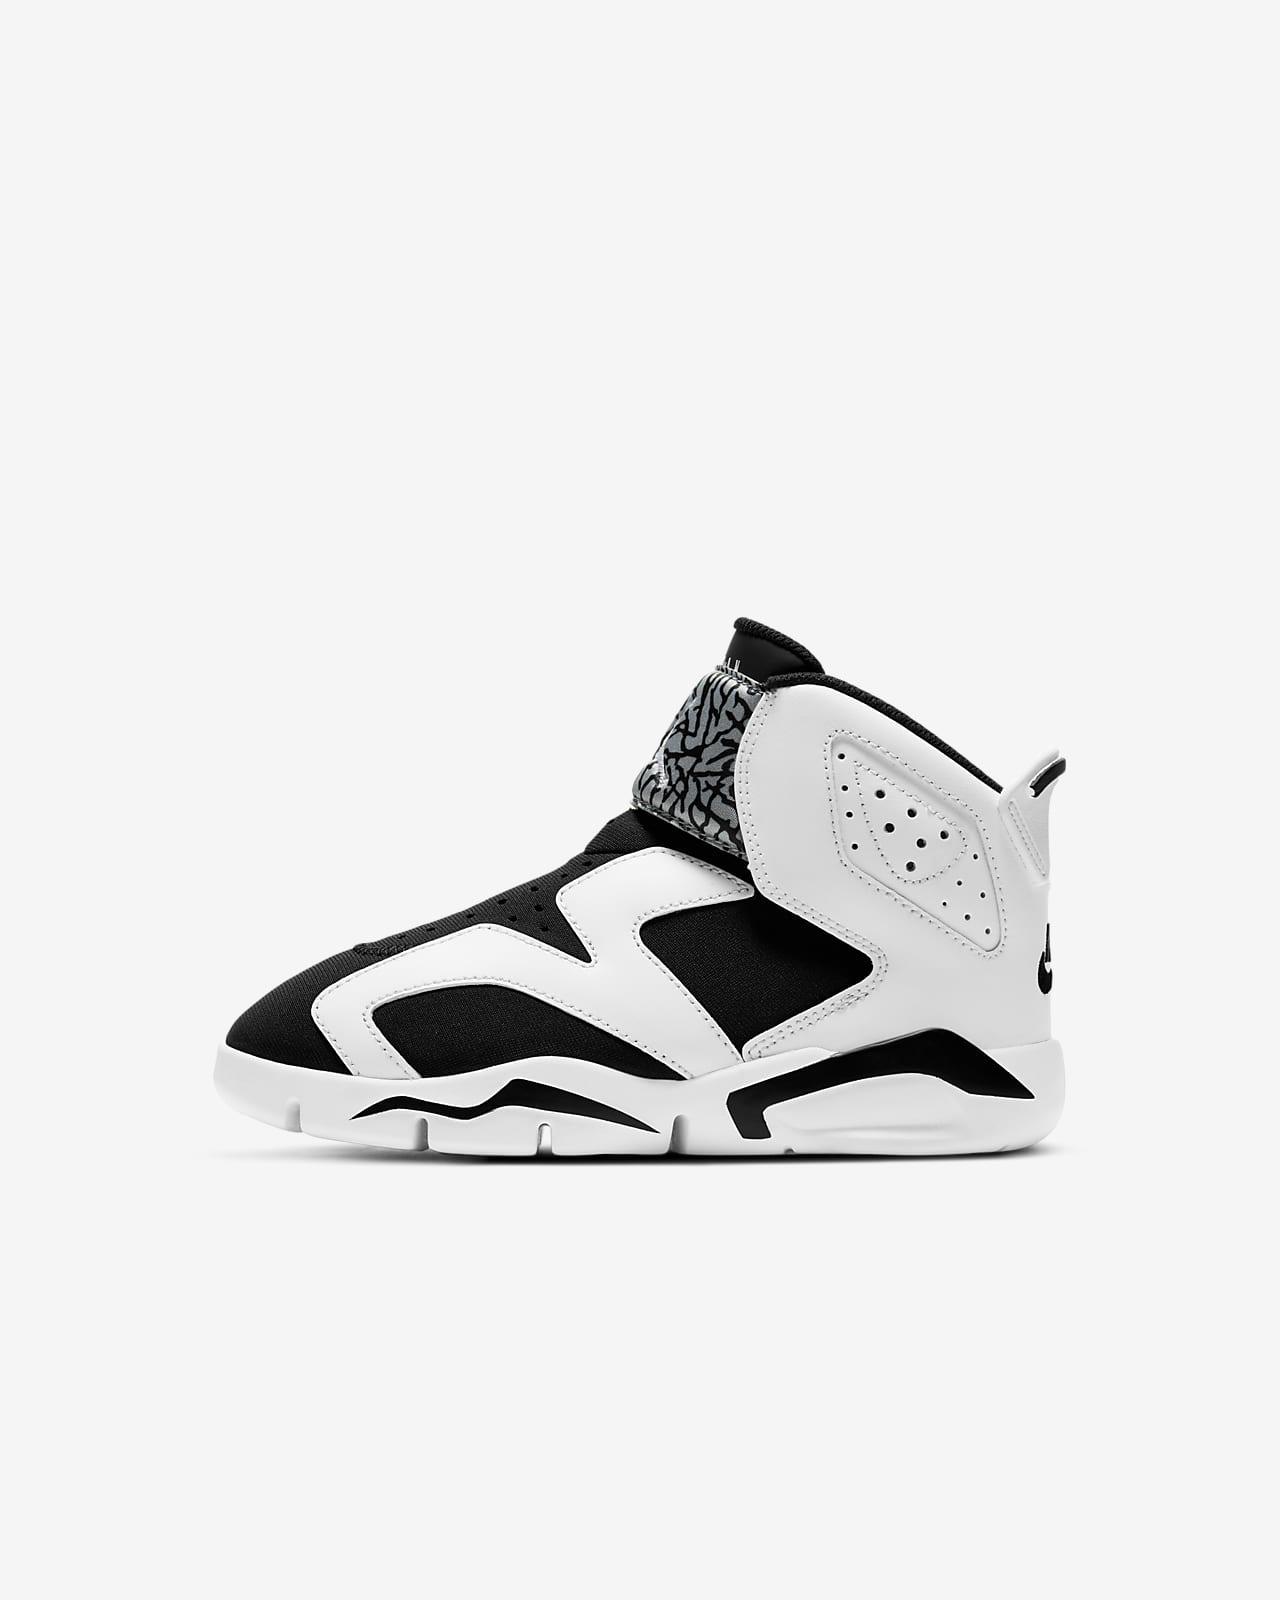 Jordan 6 Retro Little Flex Younger Kids' Shoe